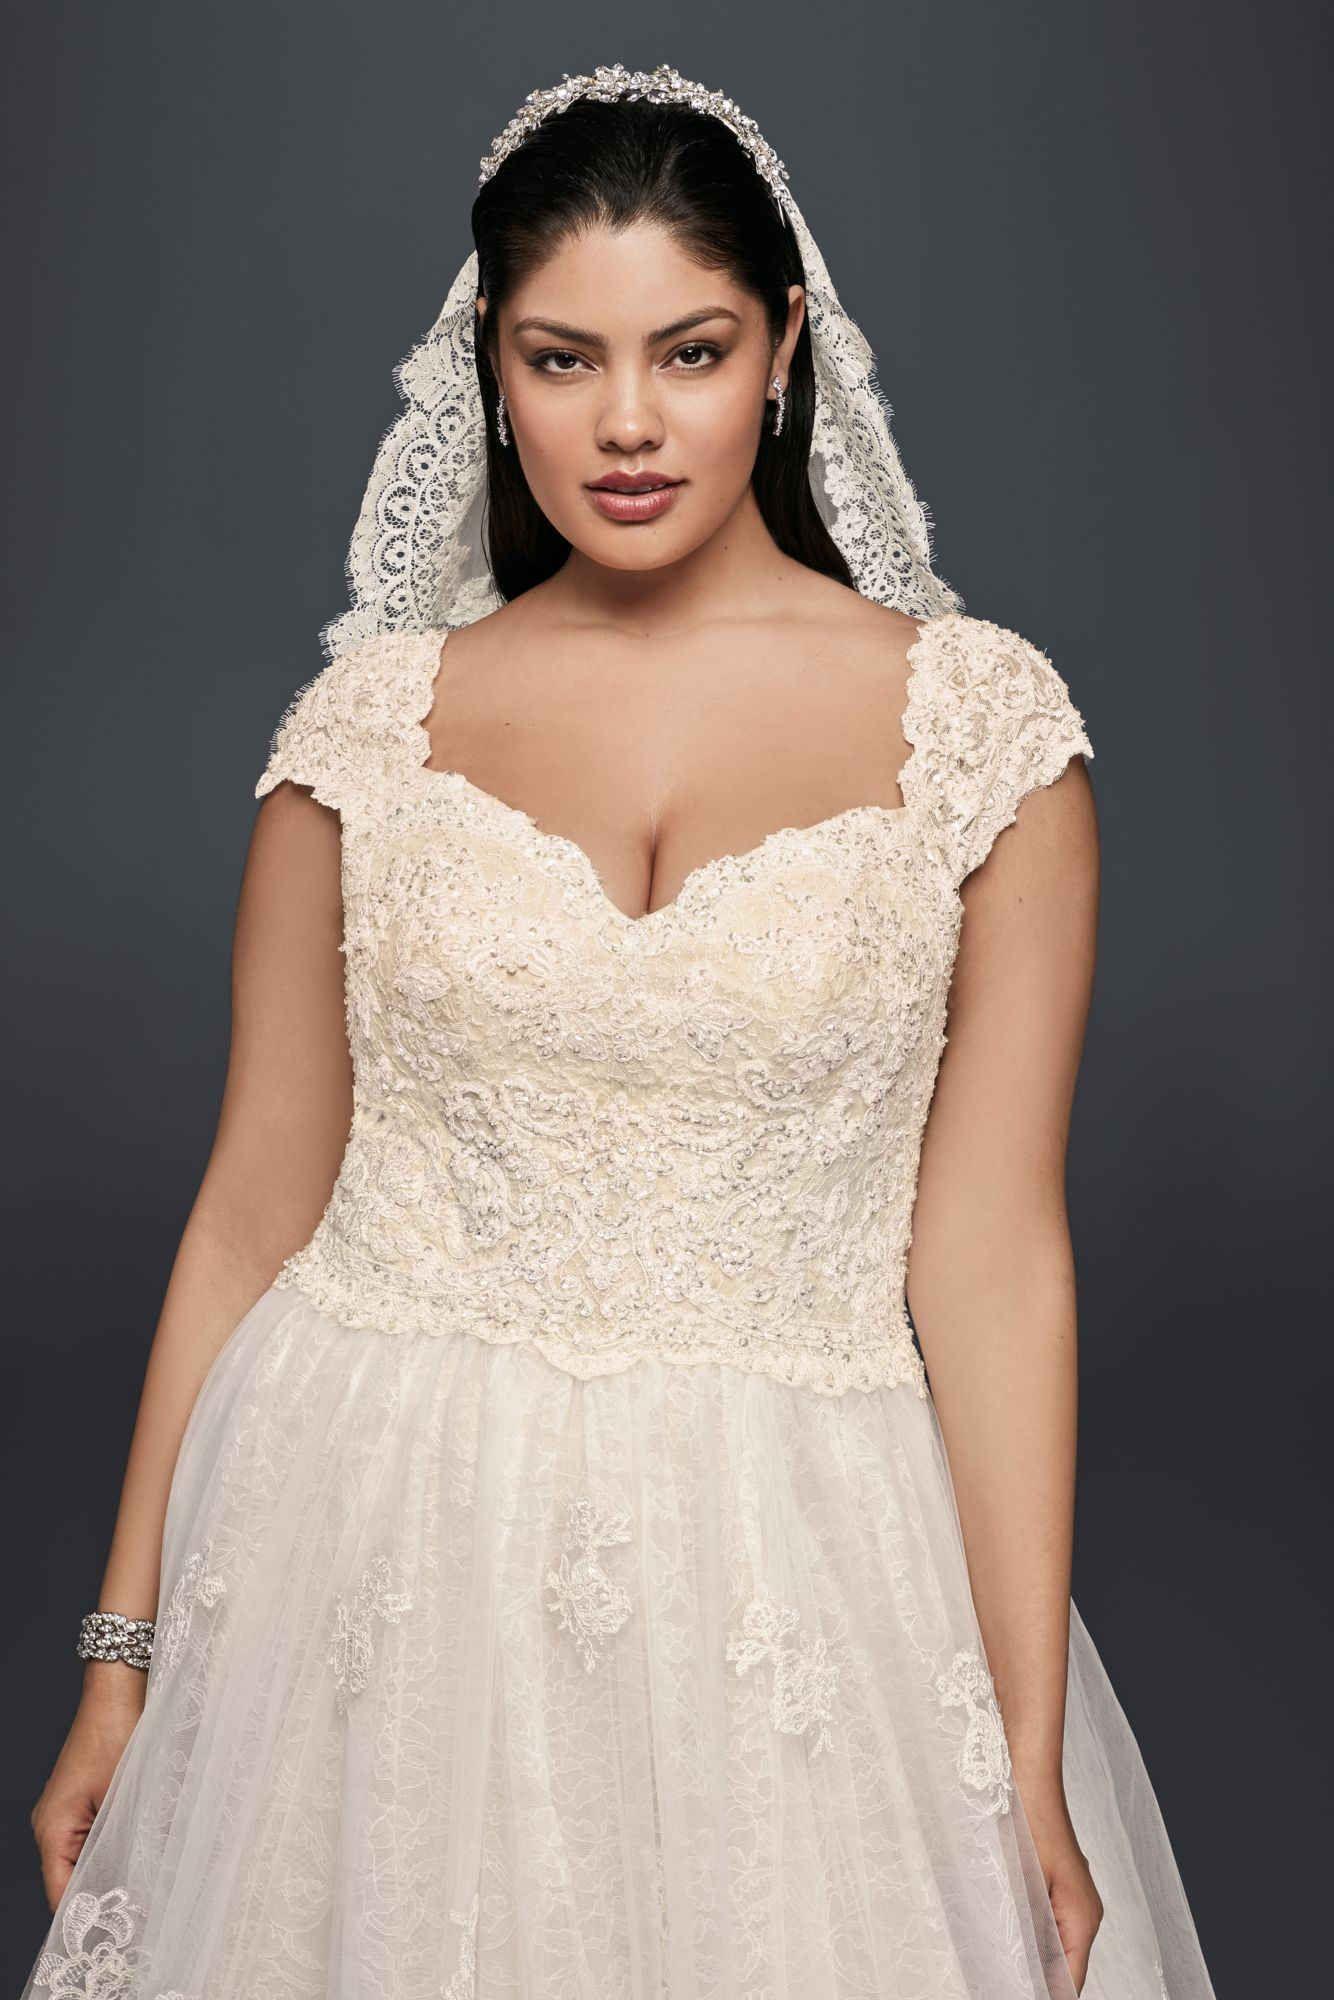 83b2a65ee687 Plus Size 8CWG768 Style Oleg Cassini Long Cap Sleeve Lace Wedding Dress